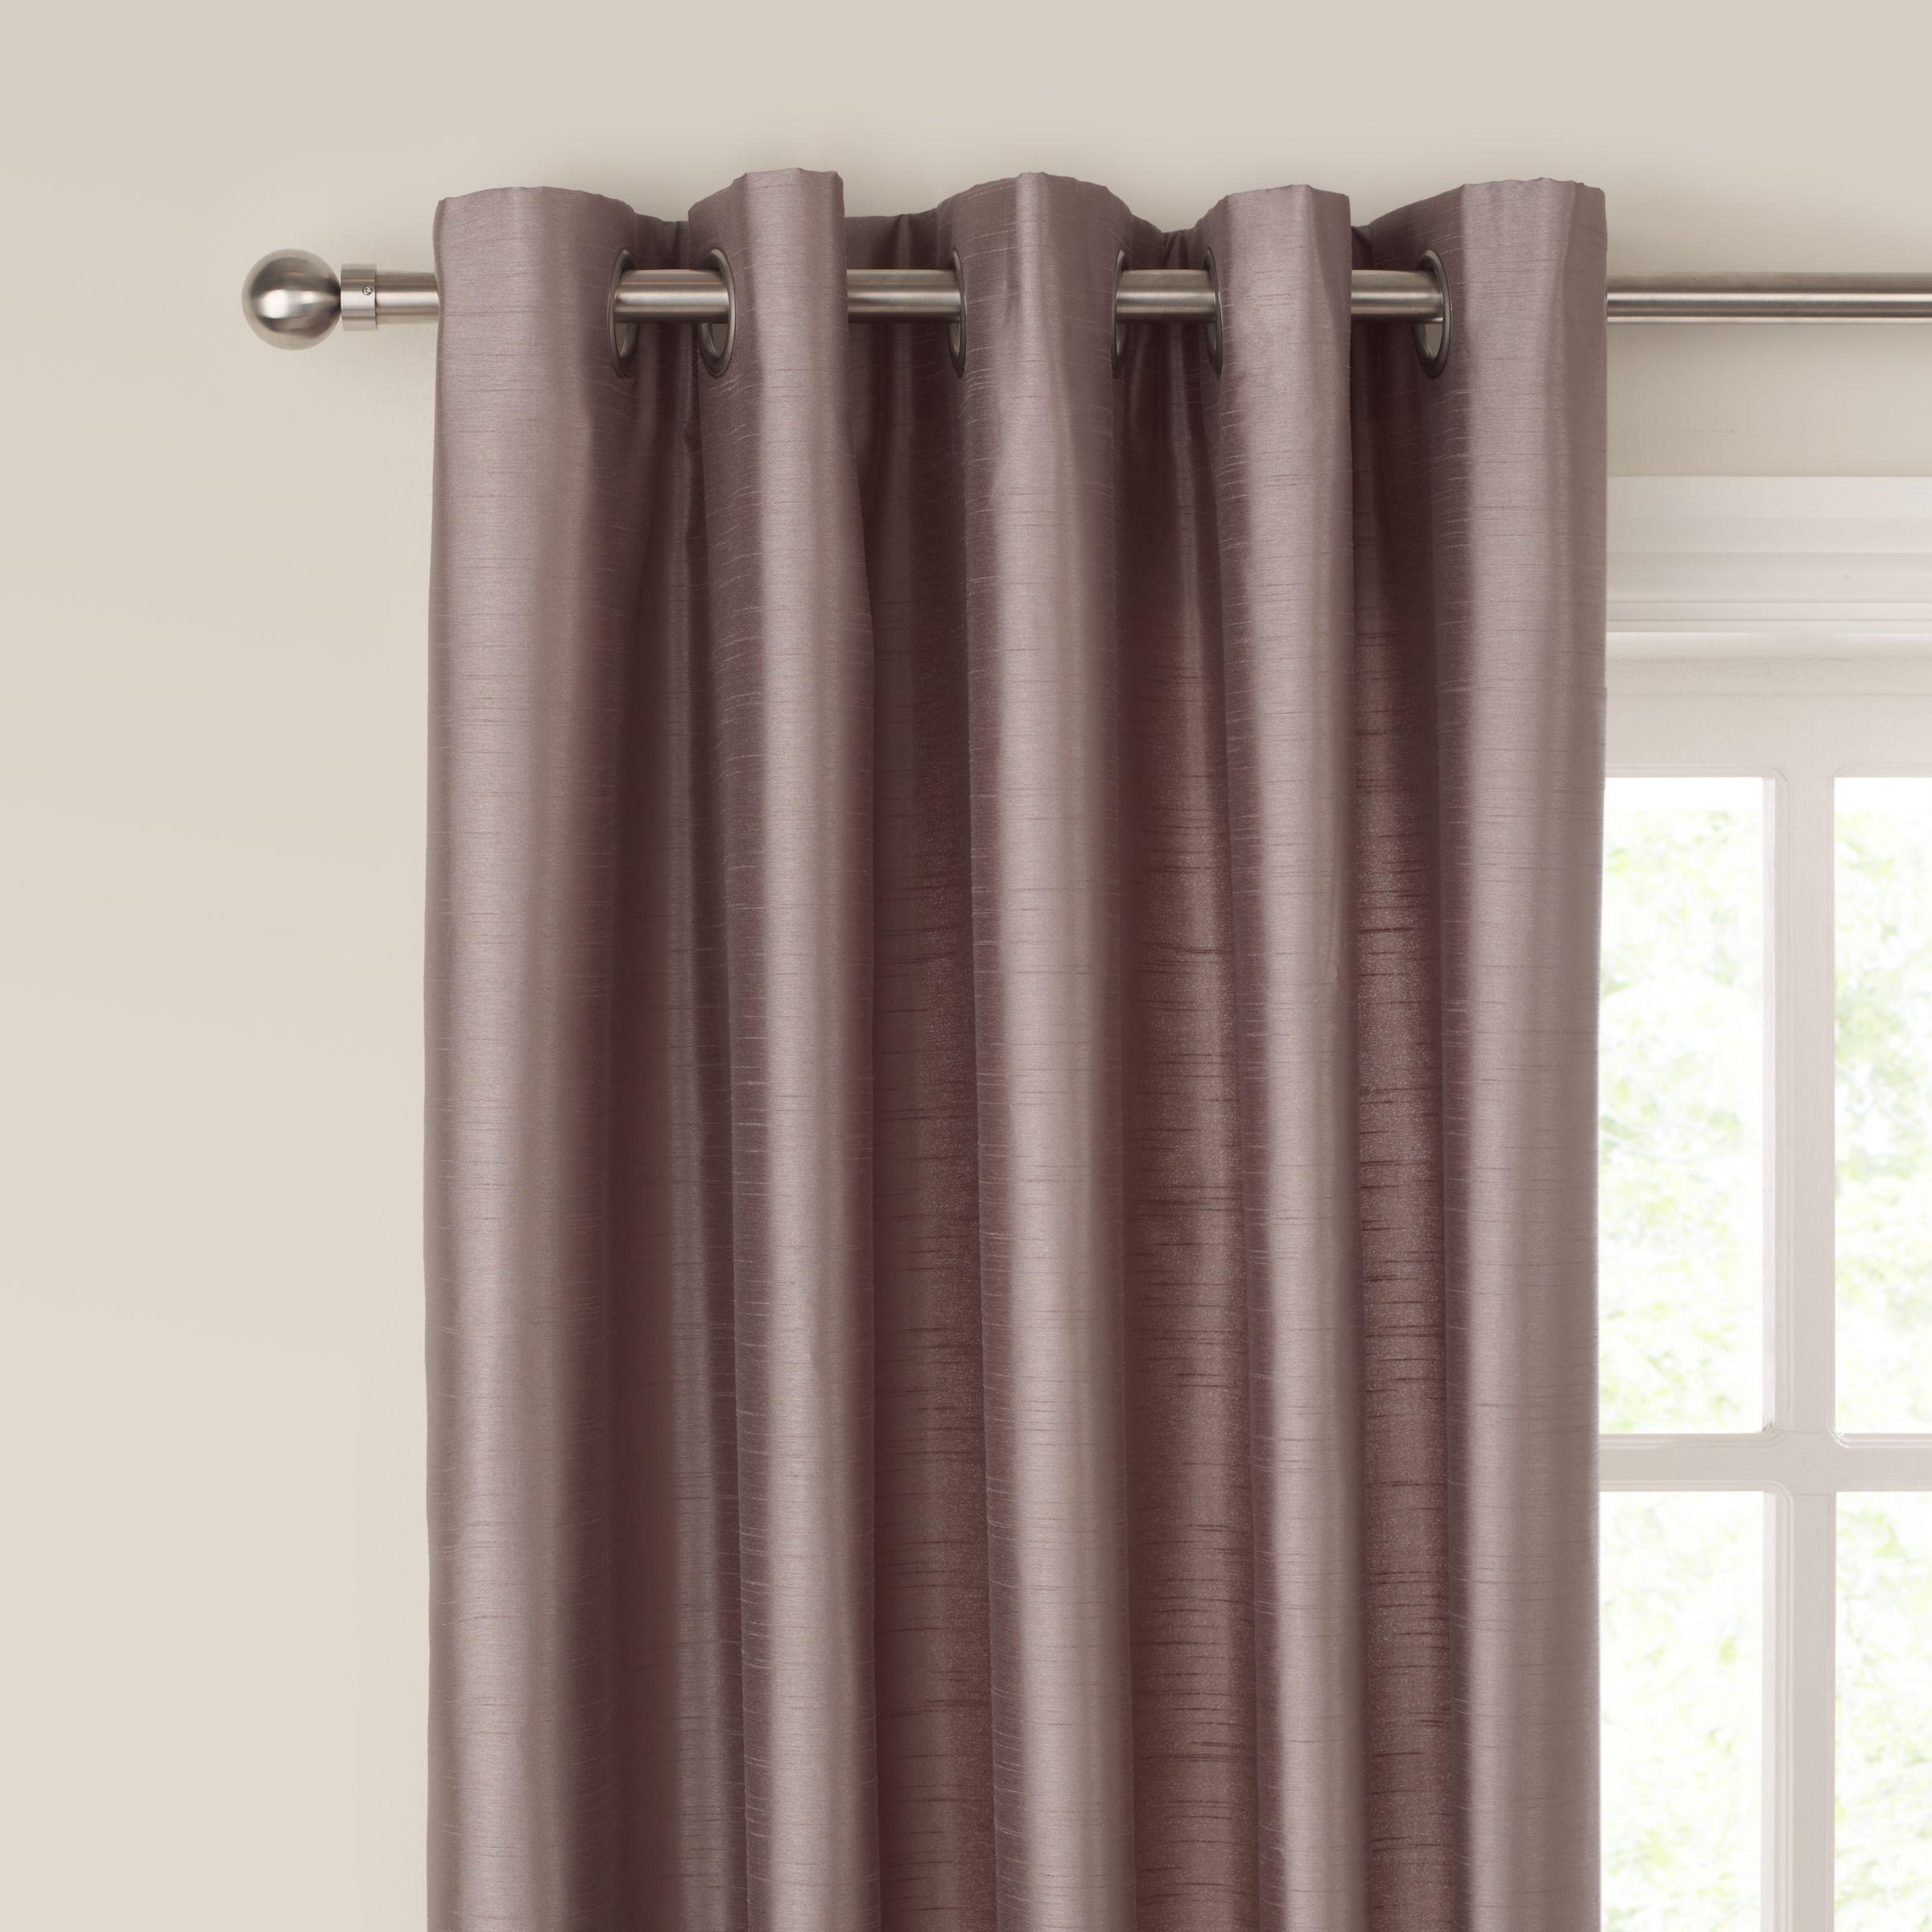 john lewis curtain poles. Black Bedroom Furniture Sets. Home Design Ideas